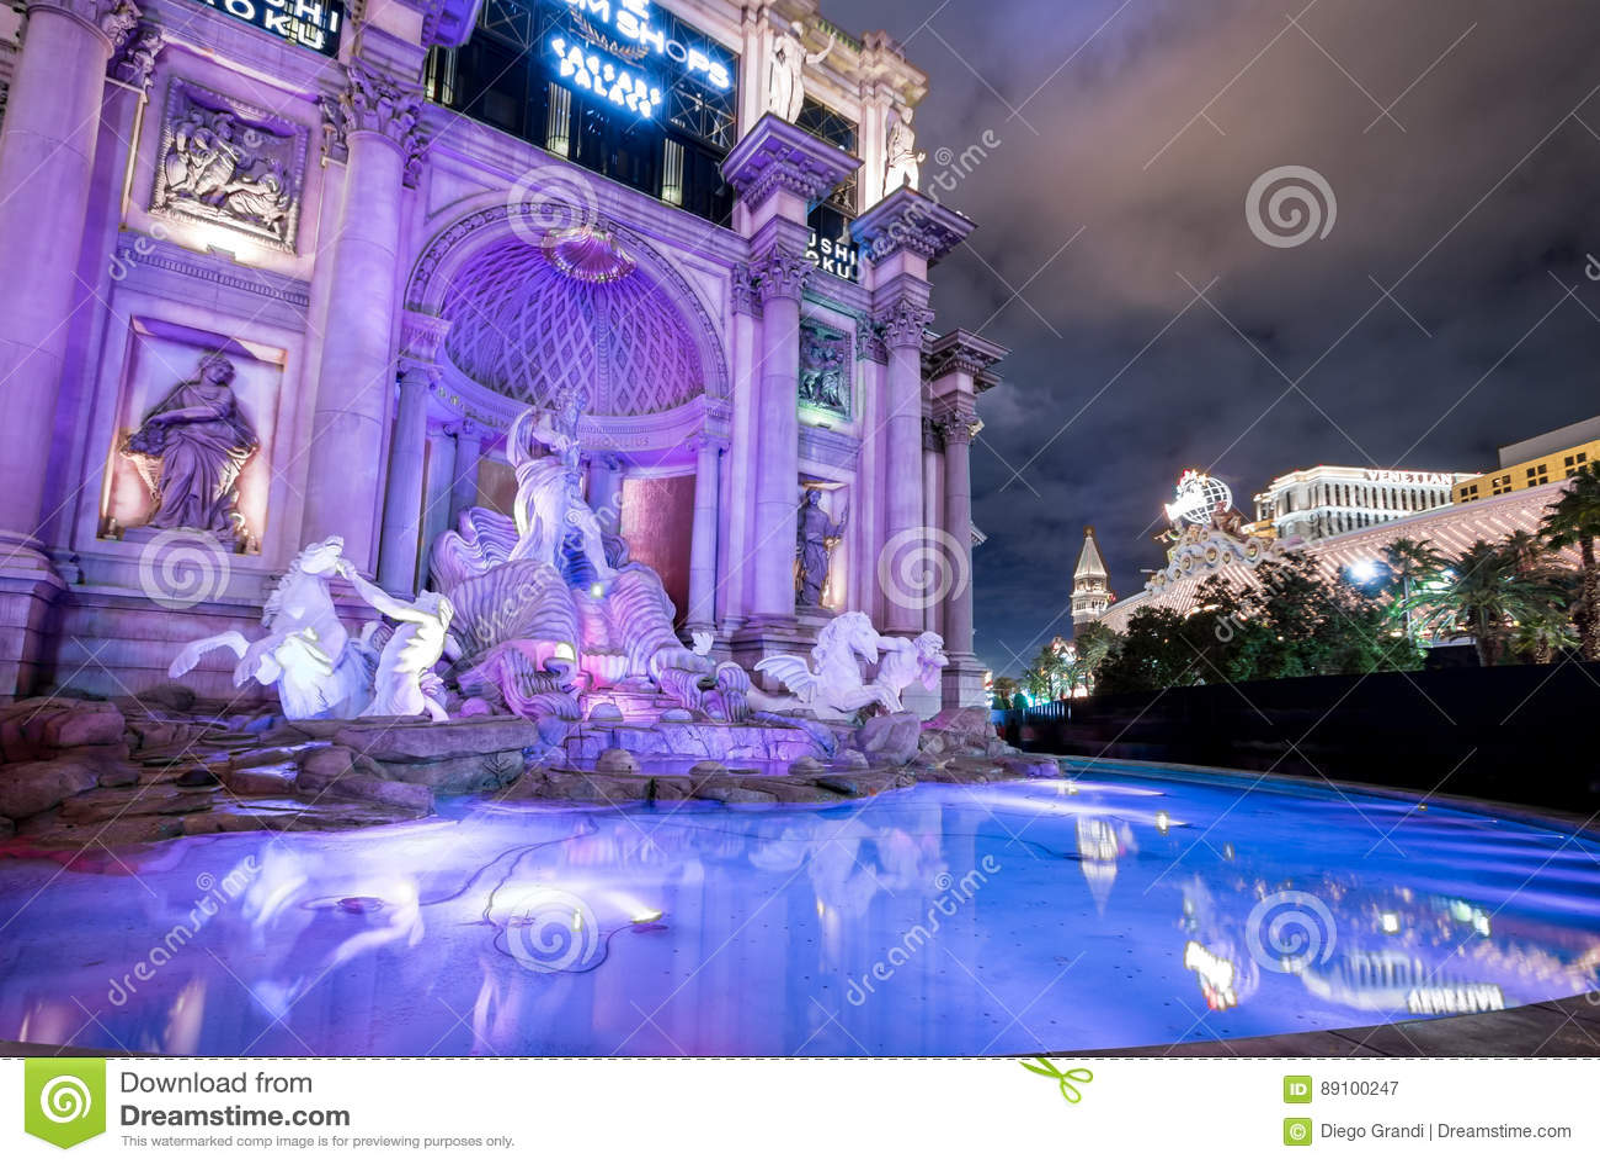 Trevi Fountain replica at Caesars Palace Hotel and Casino at night - Las Vegas, Nevada, USA